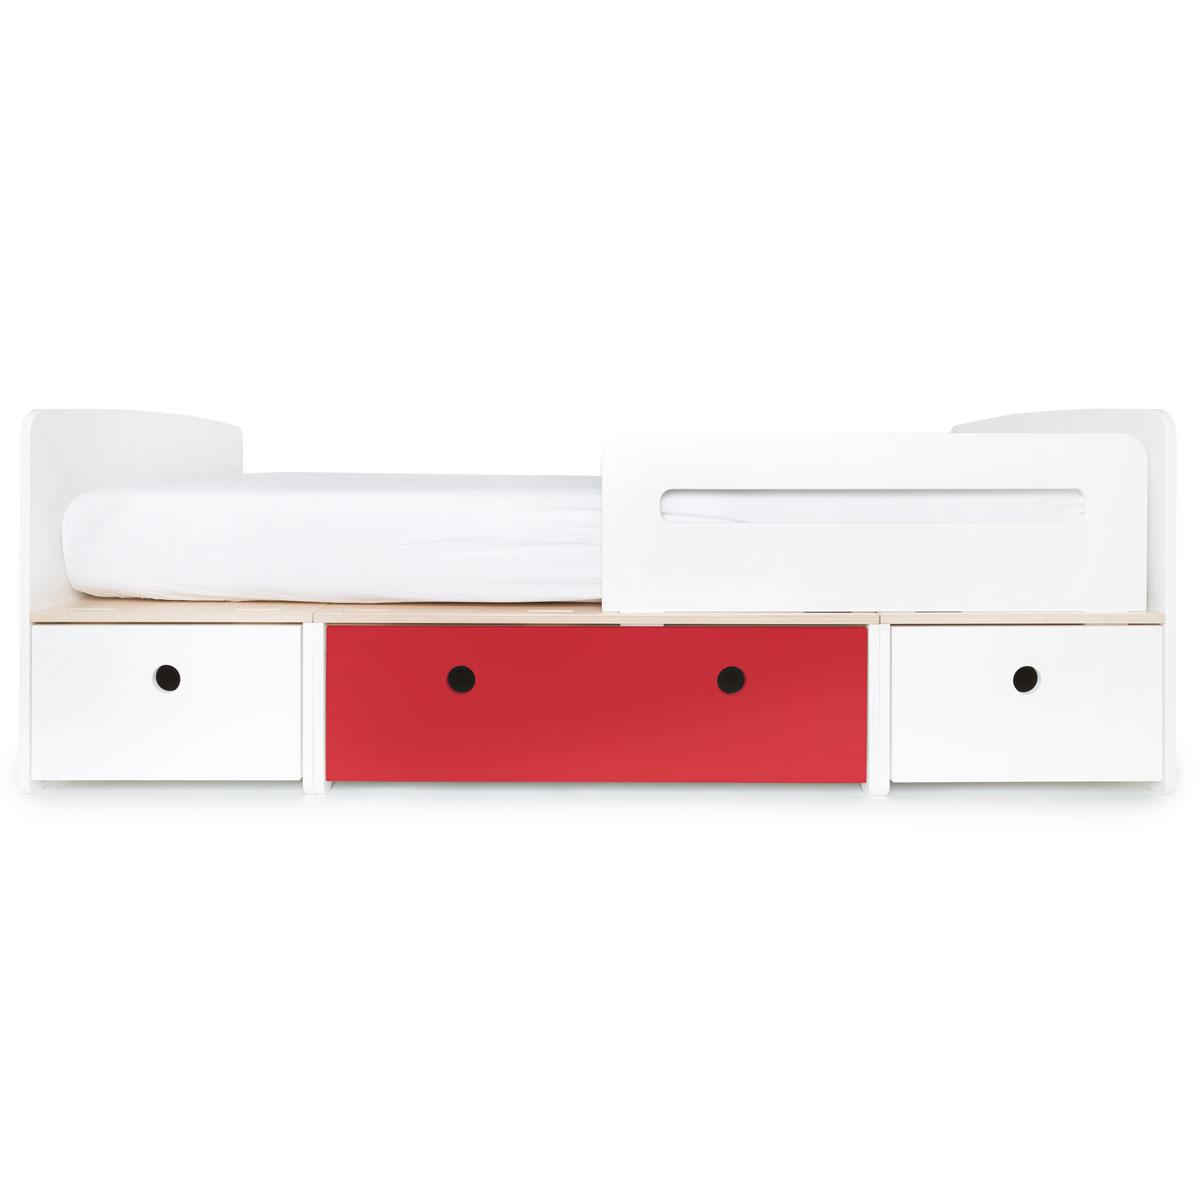 Cama evolutiva 90x200cm COLORFLEX white-true red-white